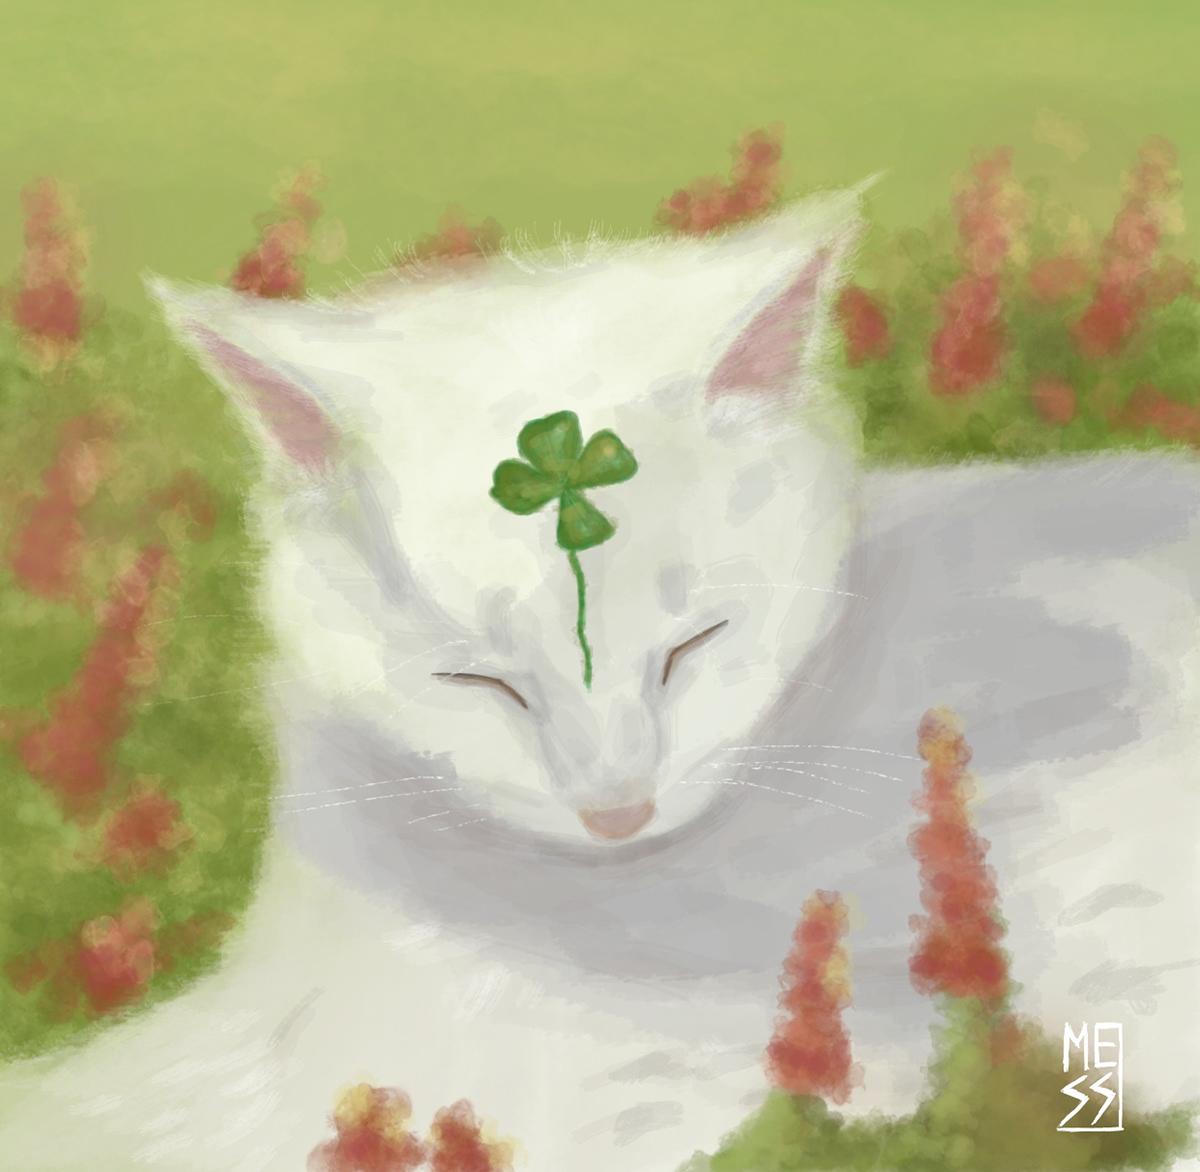 art cat drawing cat illustration cats commissions Digital Art  Pet Pet commissions pets